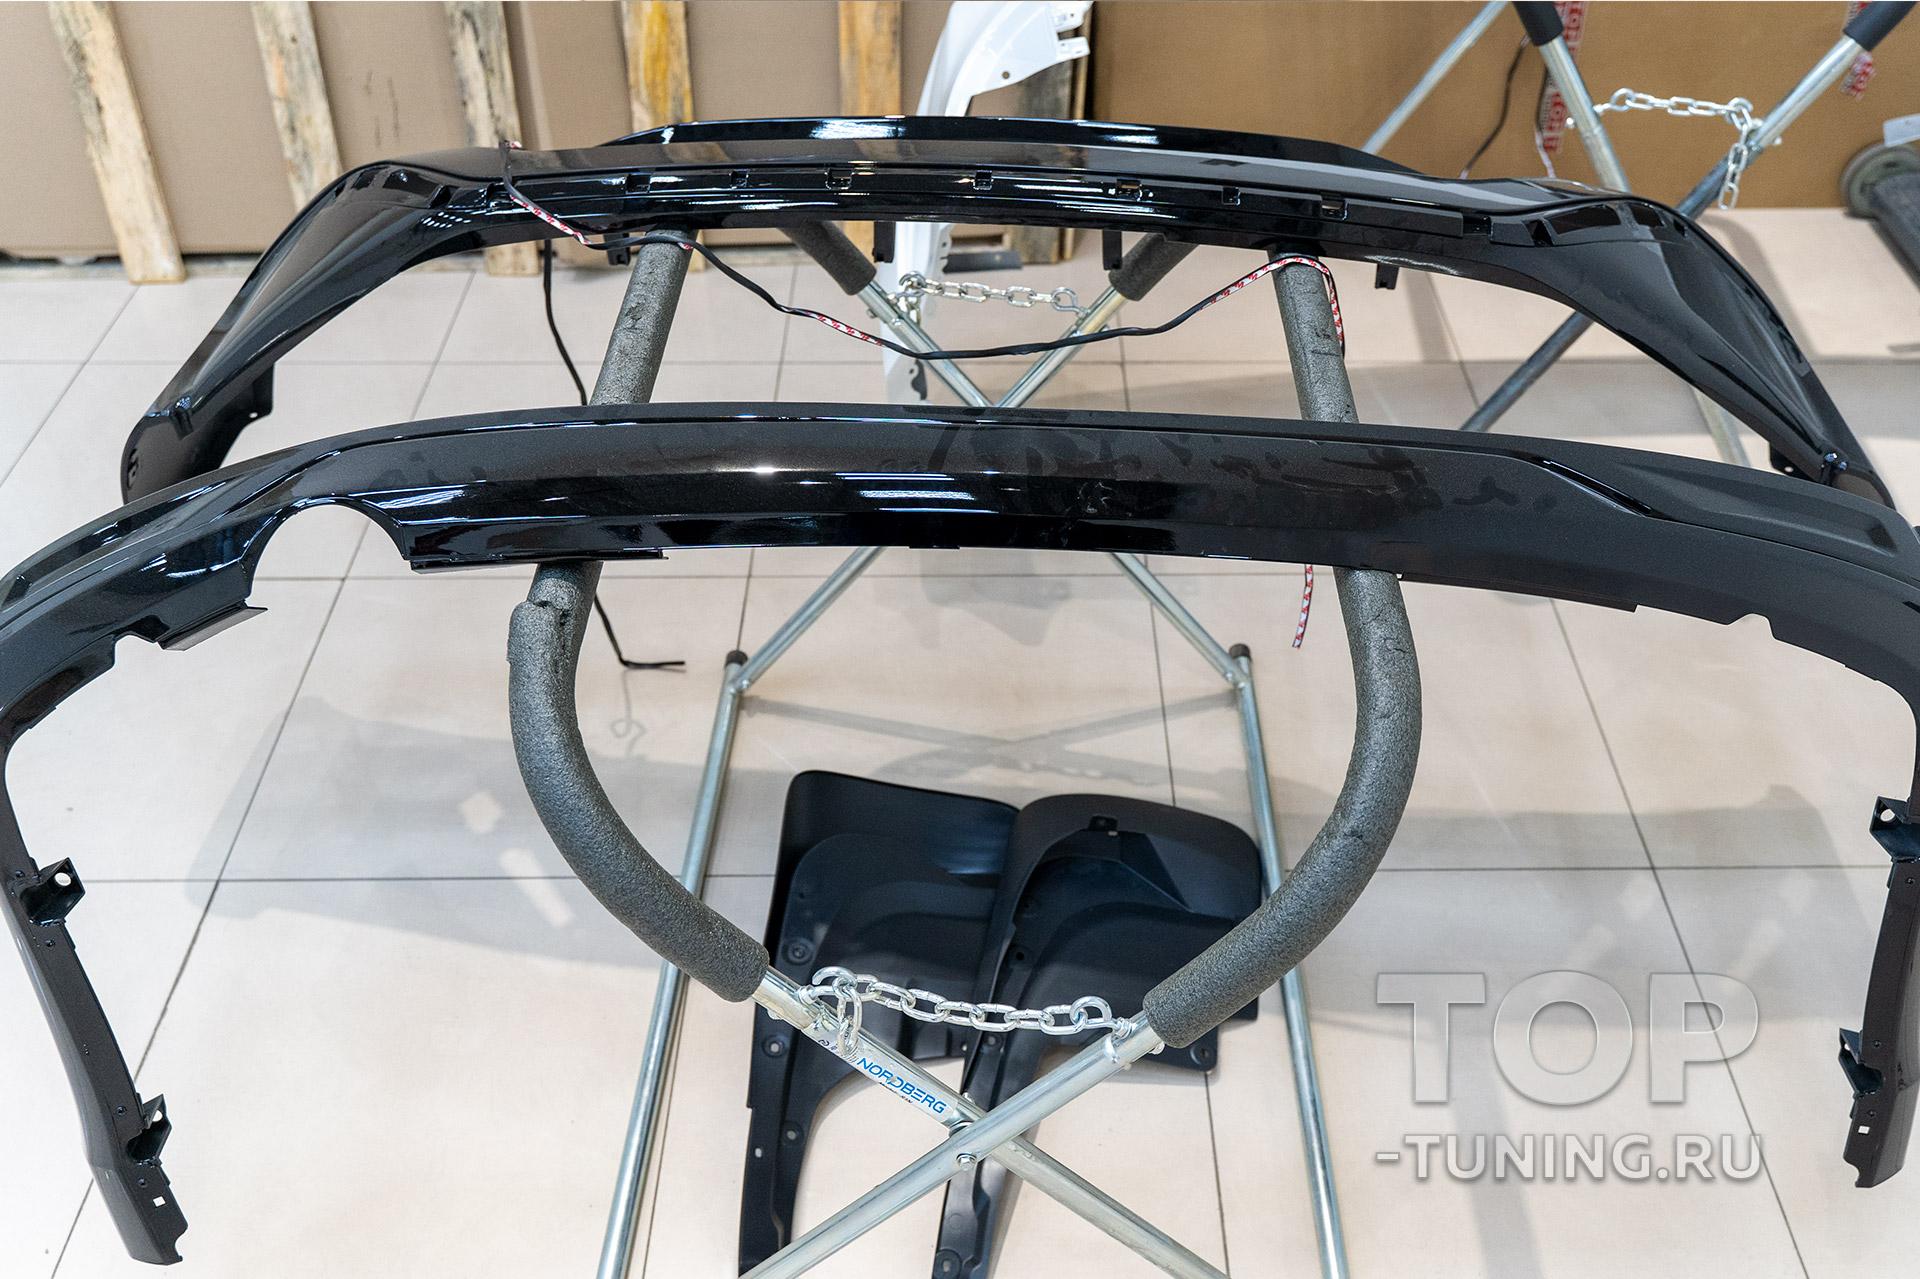 Задняя и передняя накладки для Тойота Лэнд Крузер 200